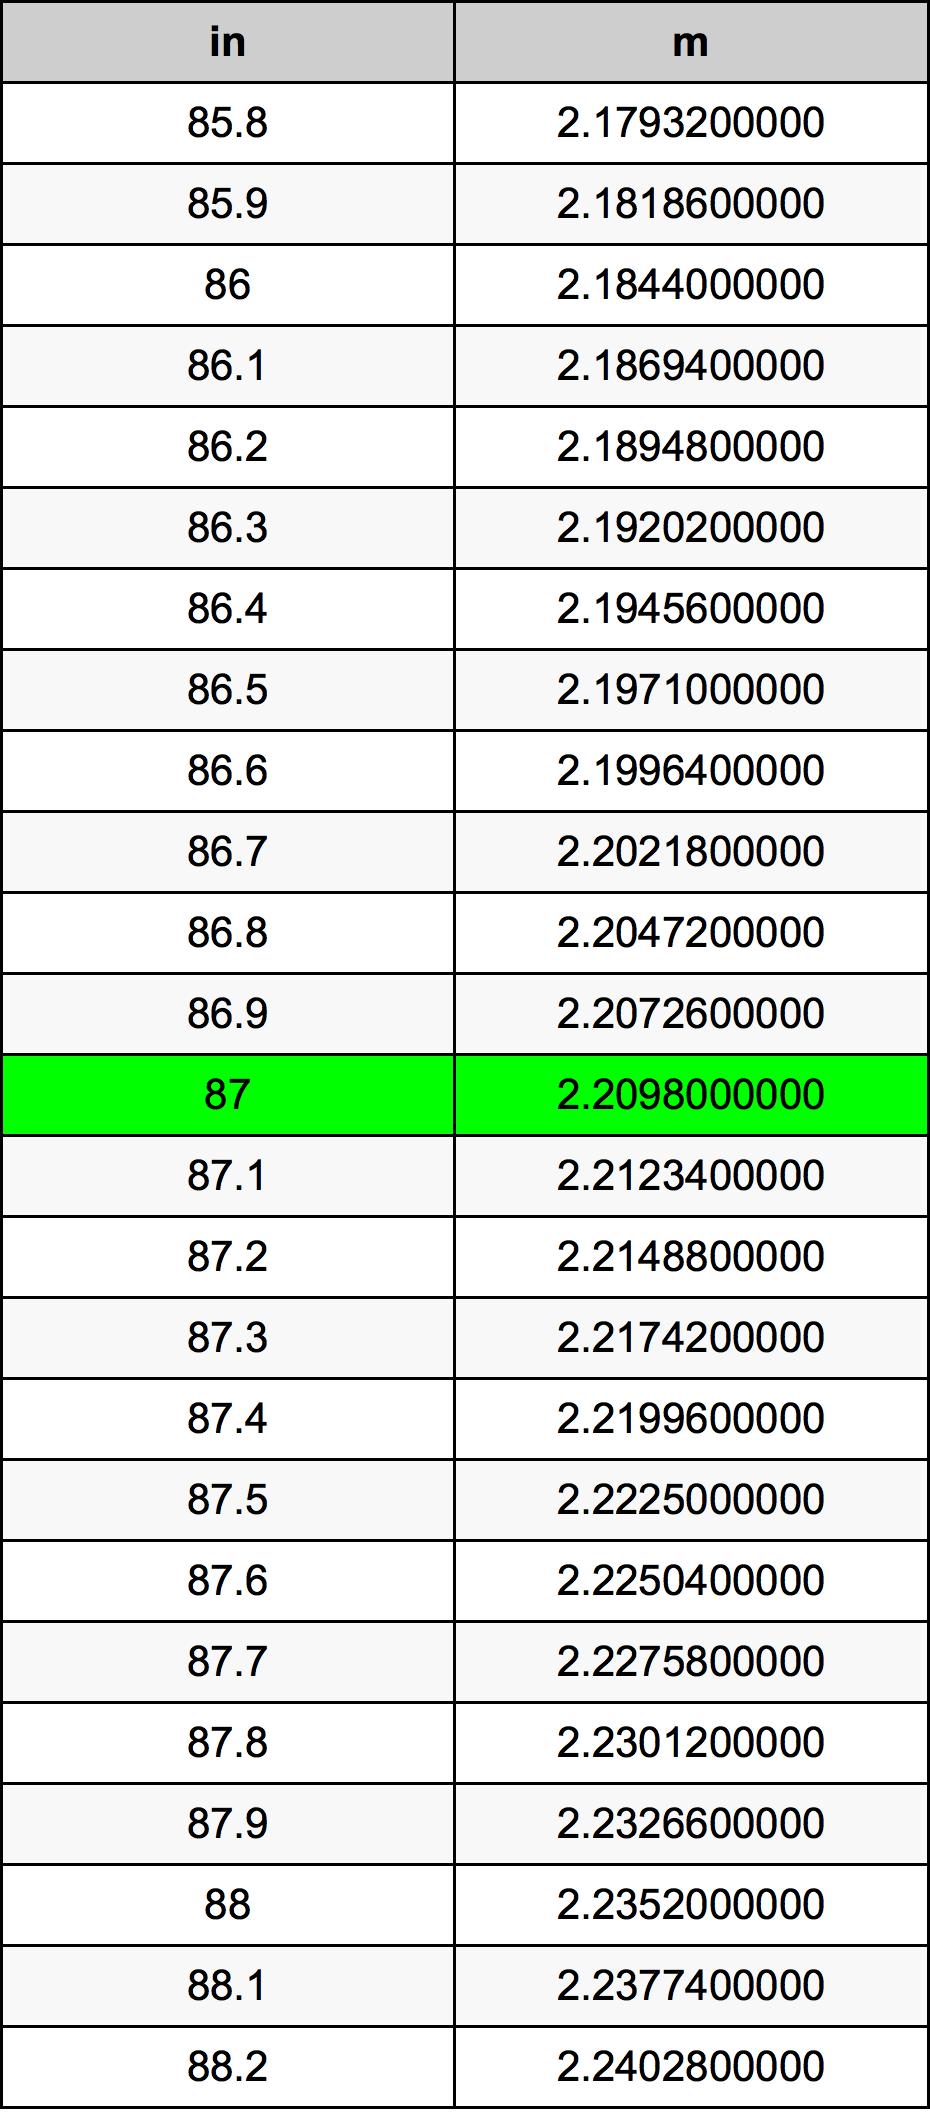 87 Inch konverteringstabell